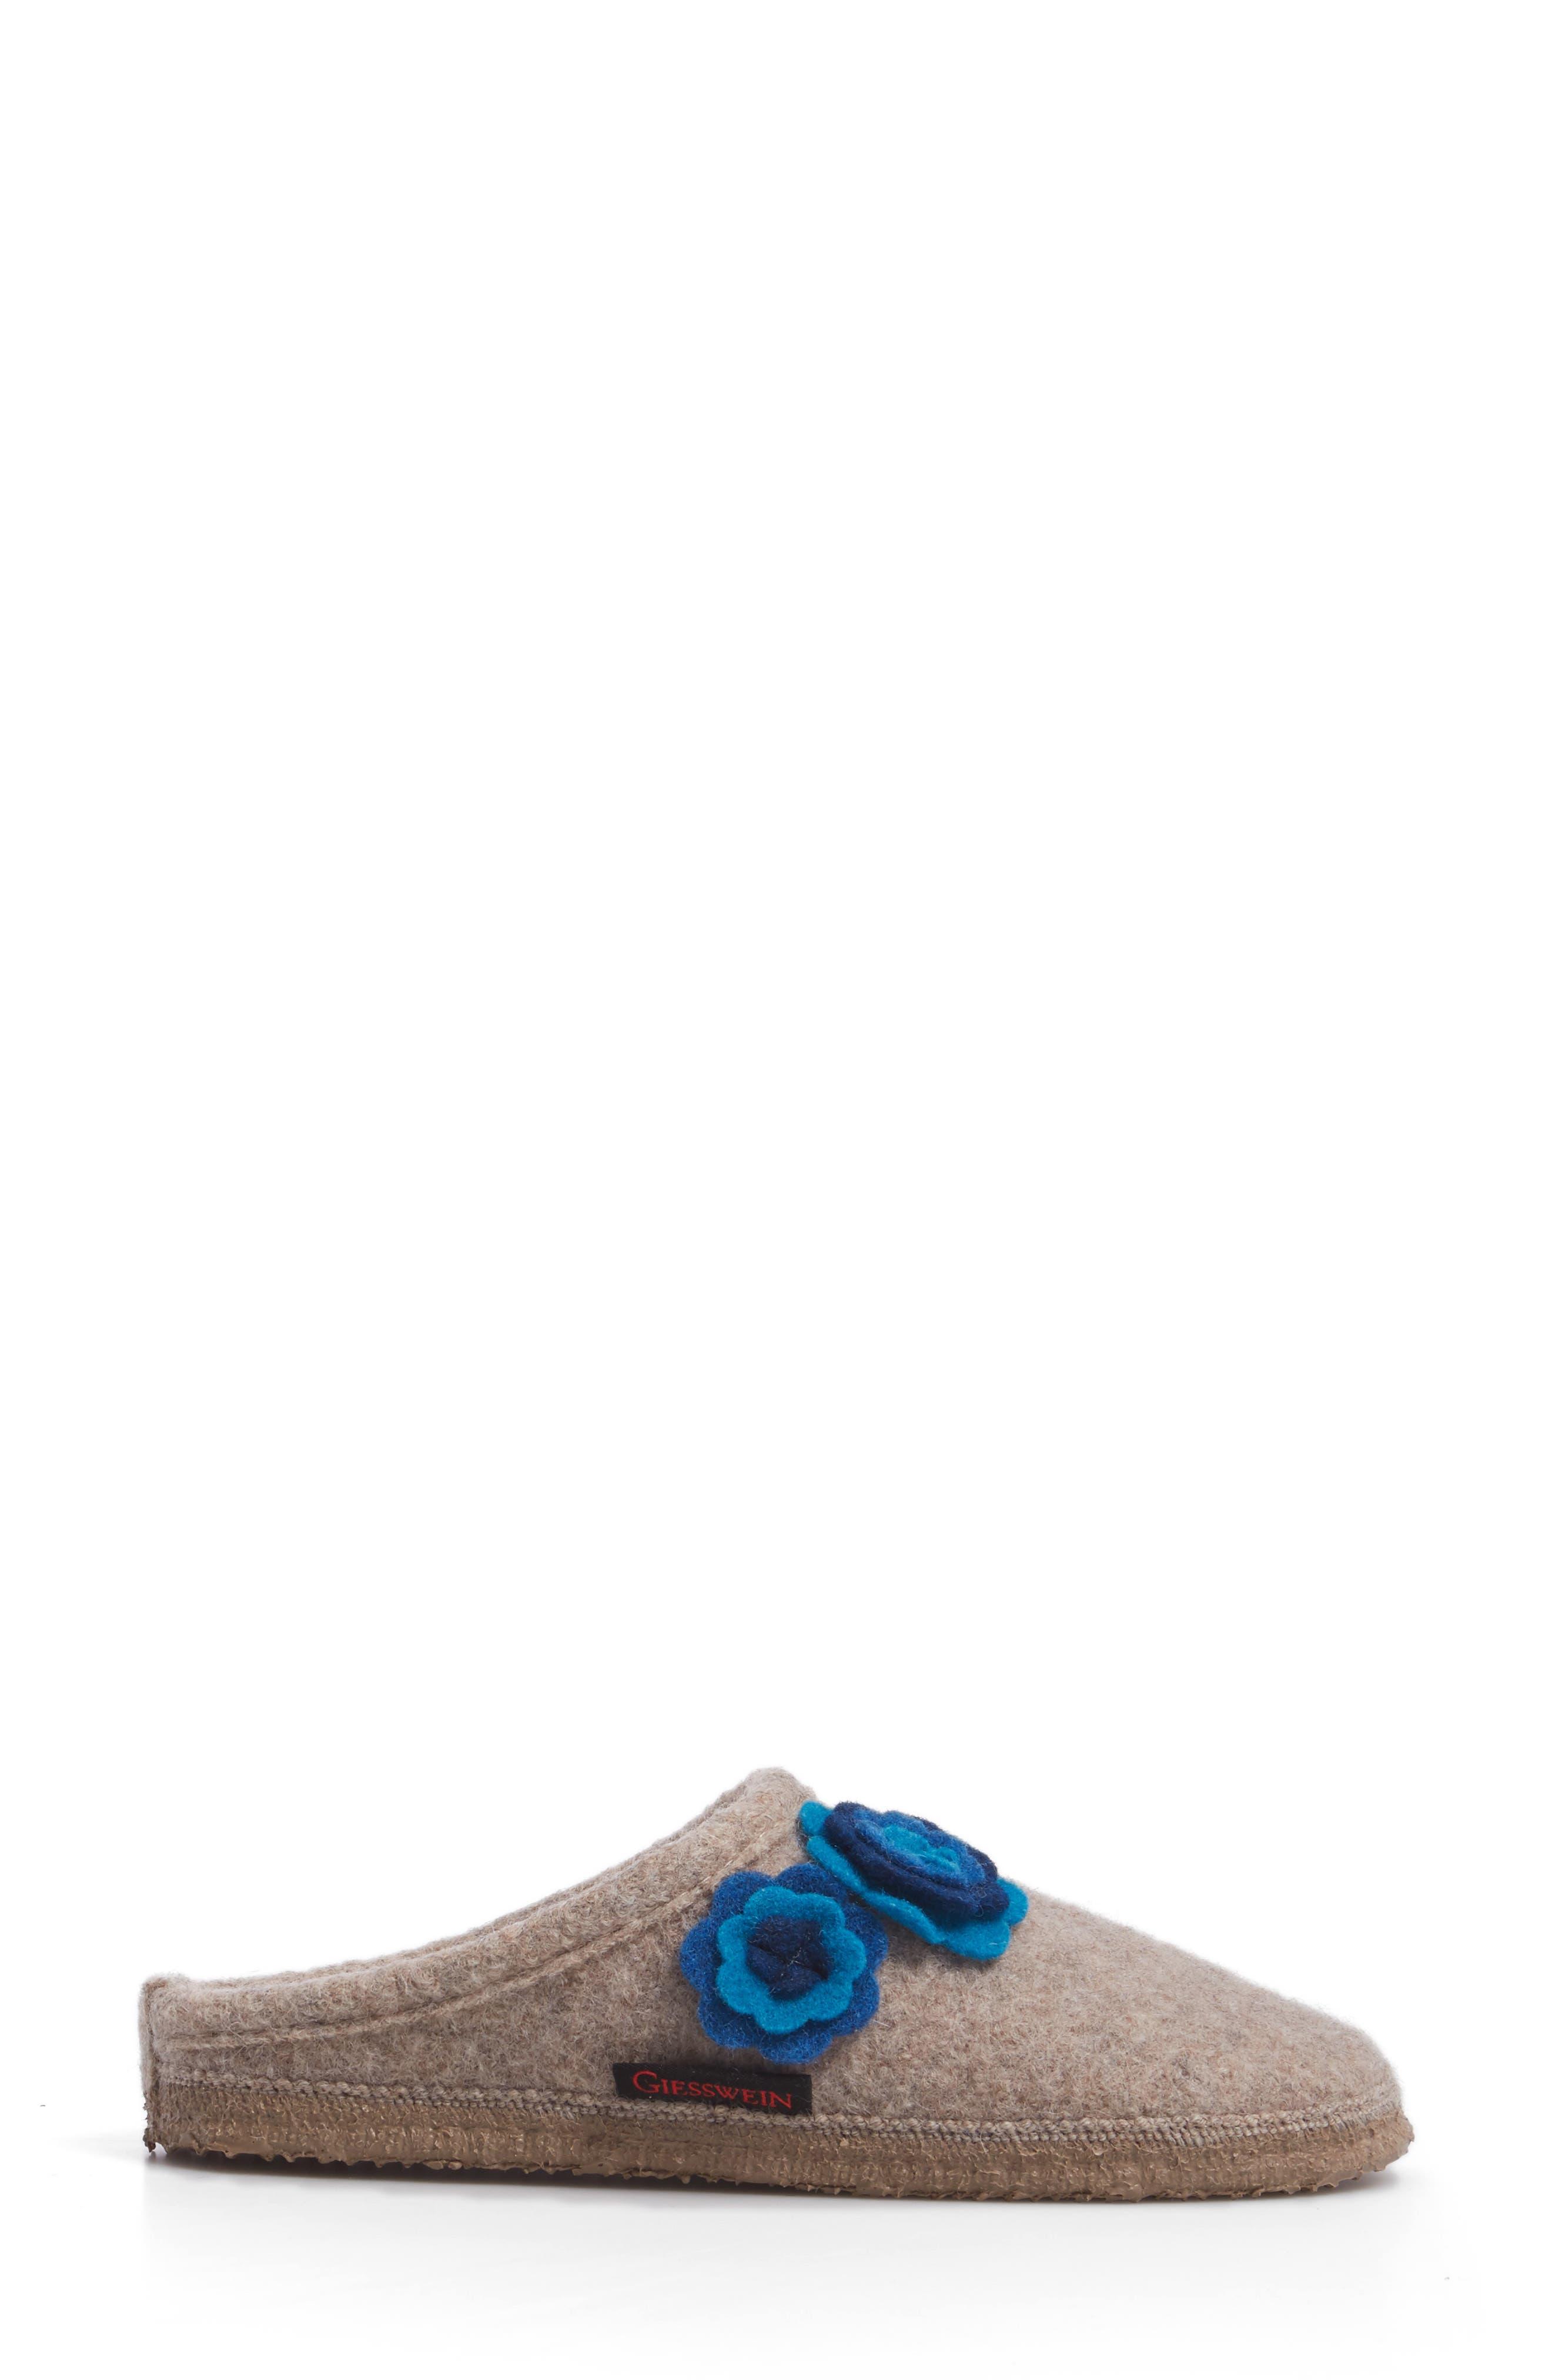 Georgie Indoor Boiled Wool Slipper,                             Alternate thumbnail 3, color,                             NATURAL WOOL